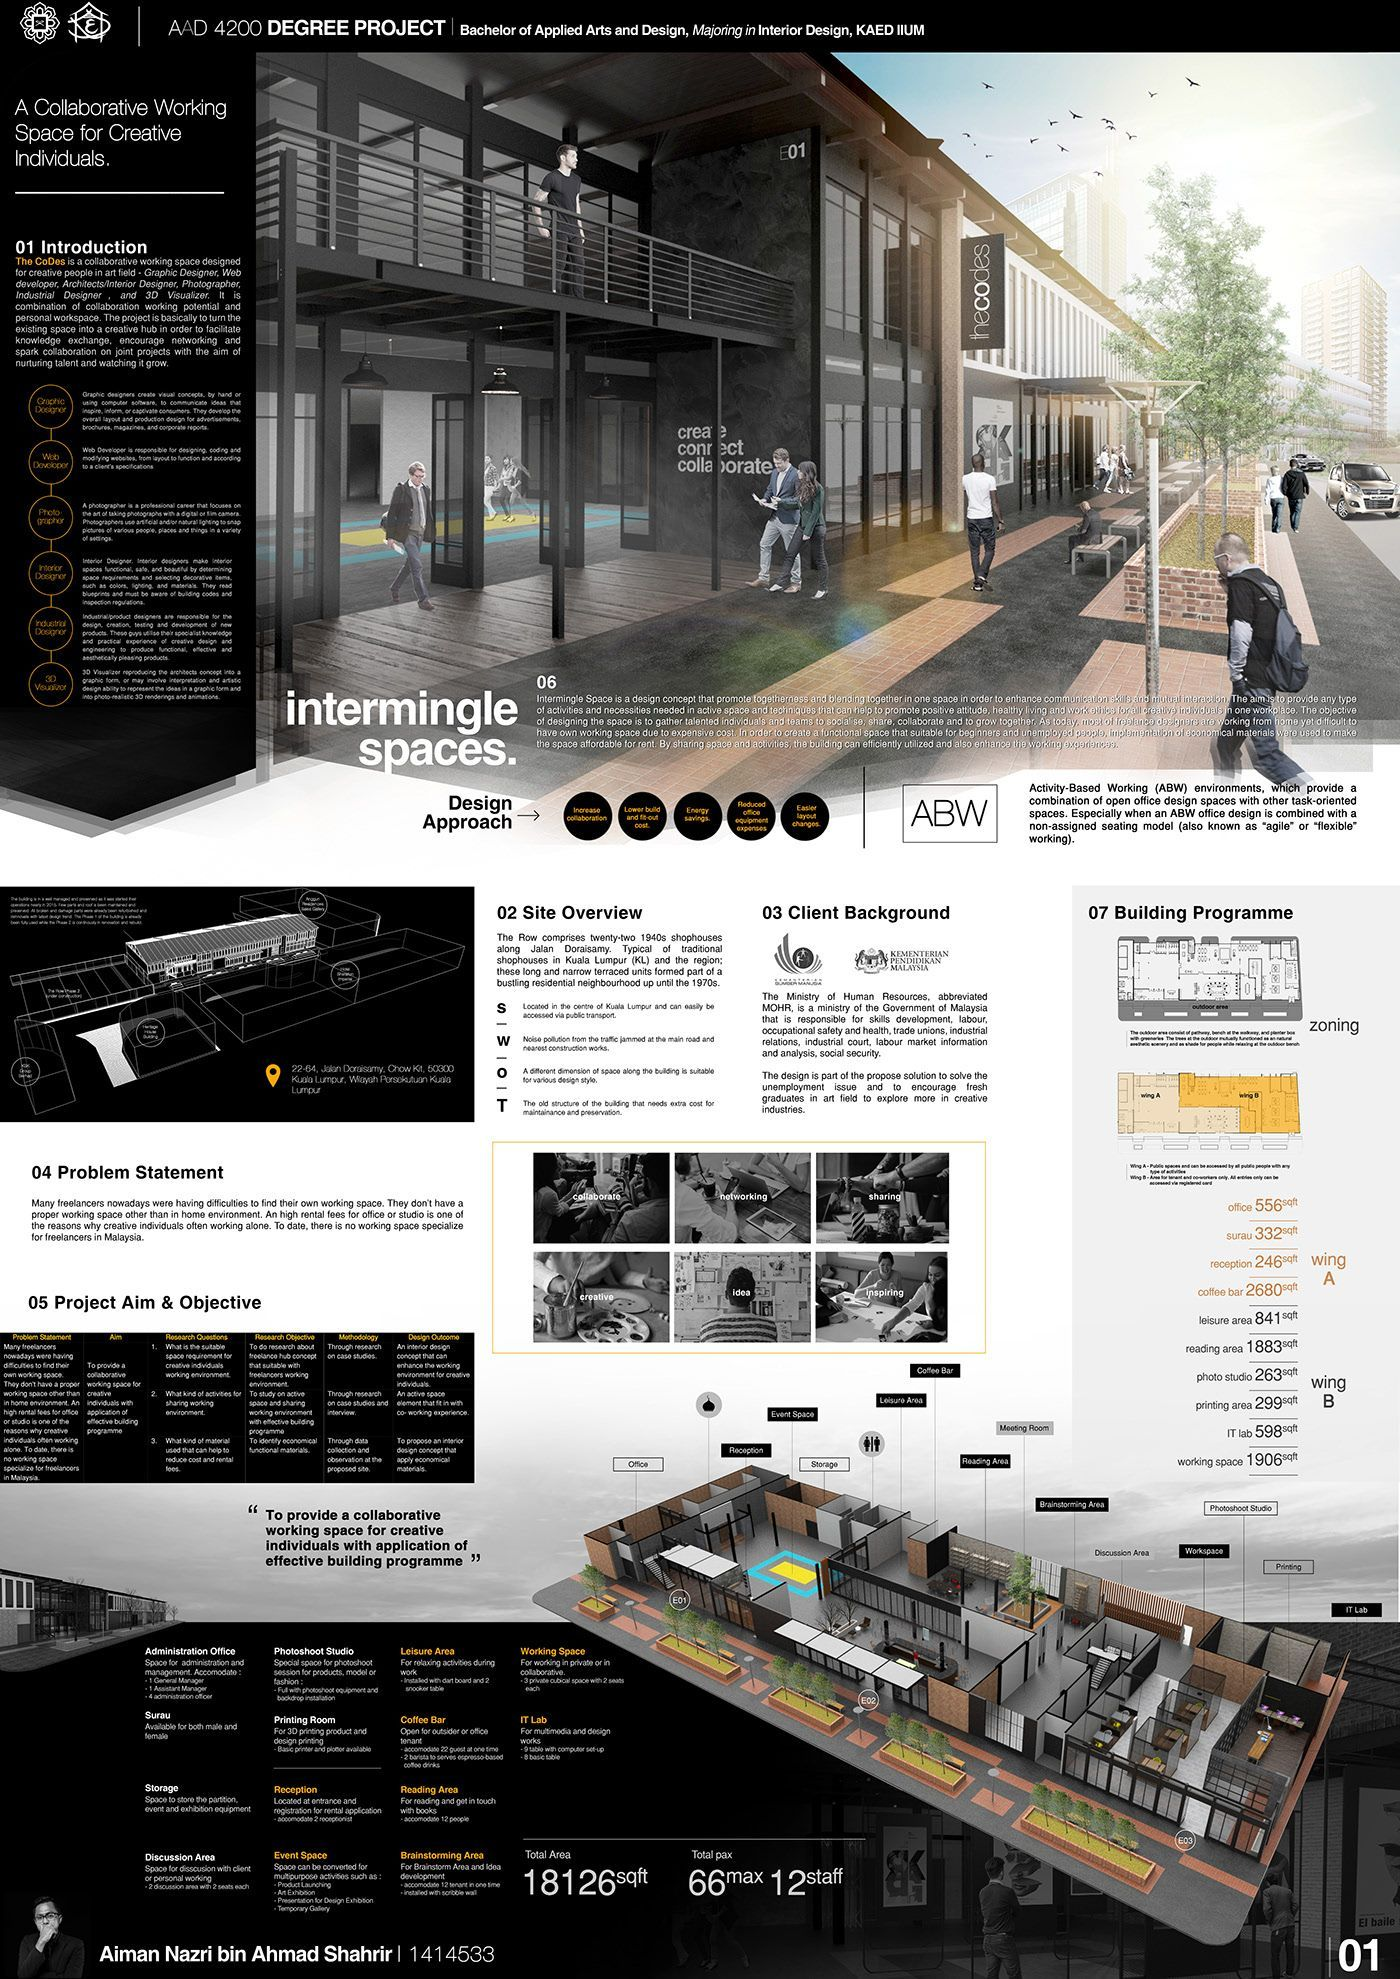 Modern Architecture Product Presentation Board Drawing Competition In 2020 Interior Design Presentation Boards Interior Design Presentation Presentation Board Design